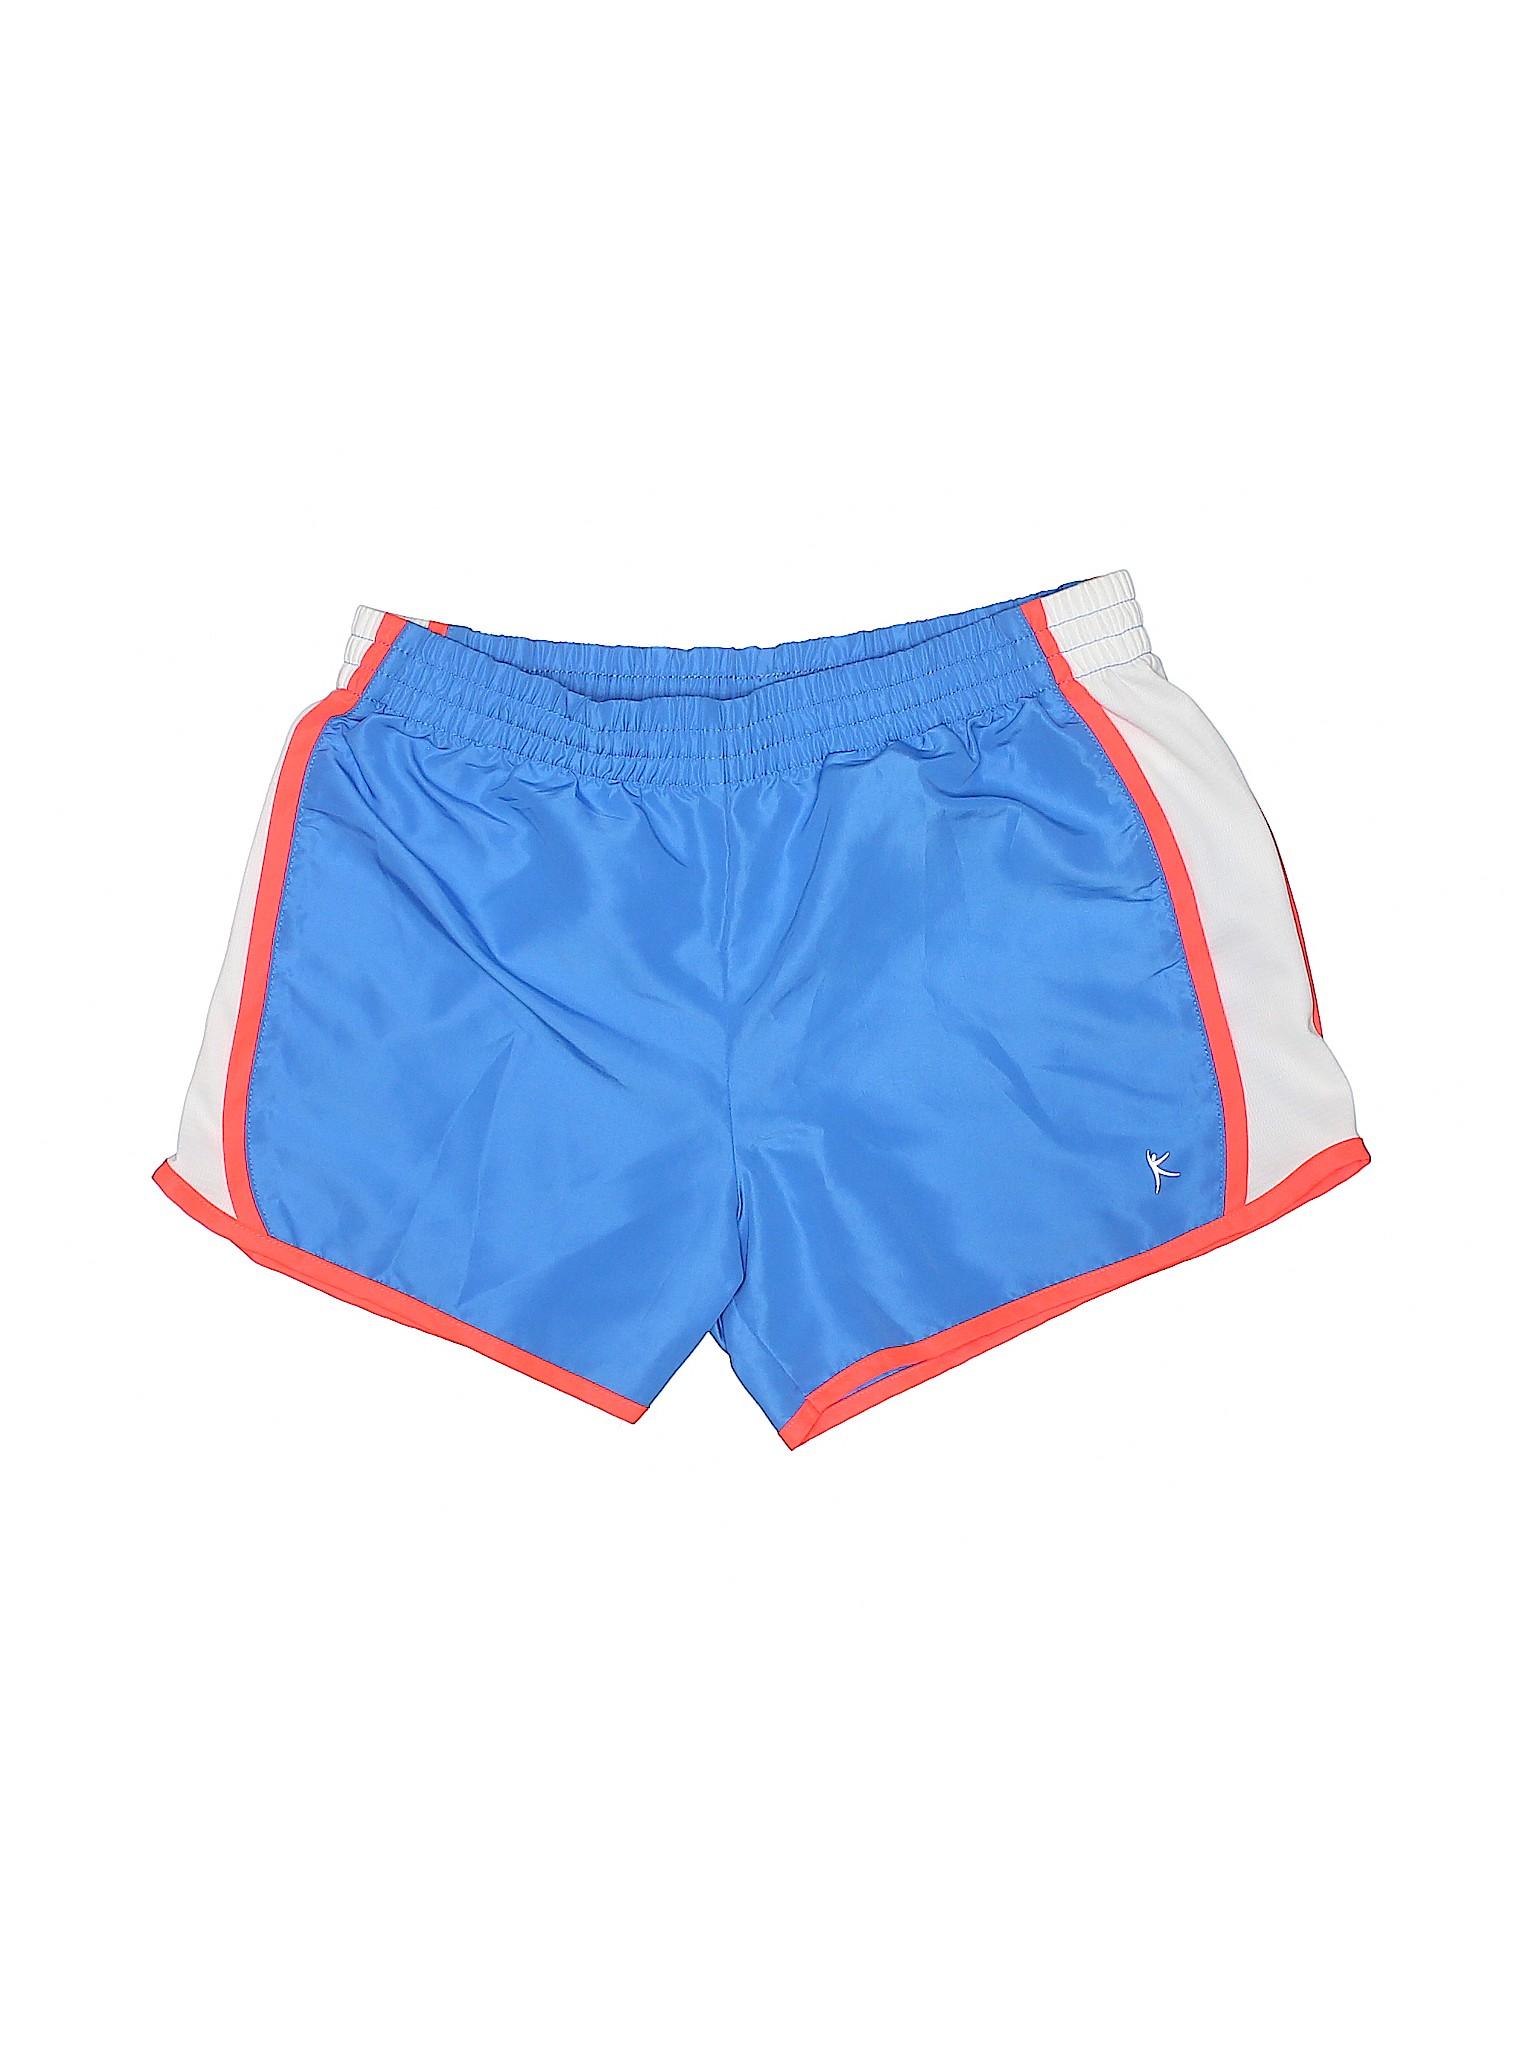 Athletic Matty Leisure M Boutique Shorts S6Zqg0